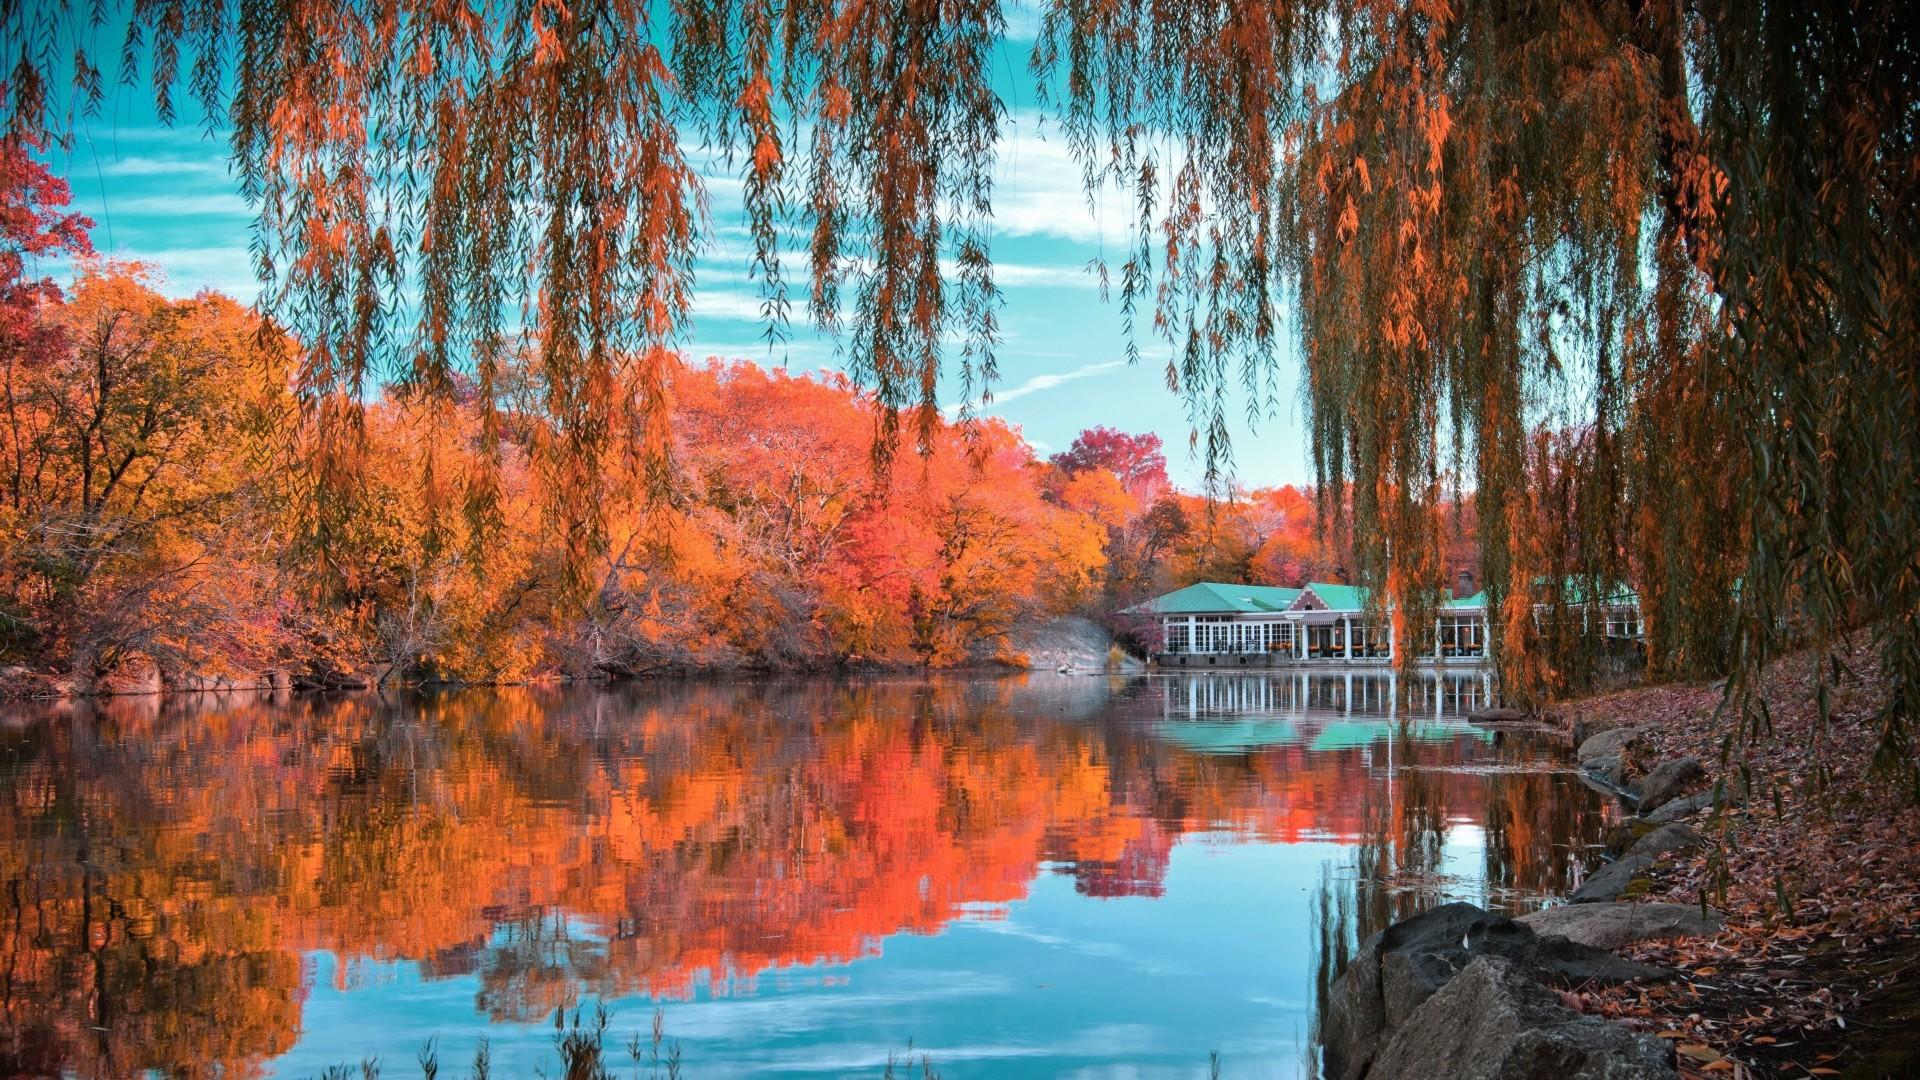 Wallpaper central park, new york, autumn, beautiful landscape